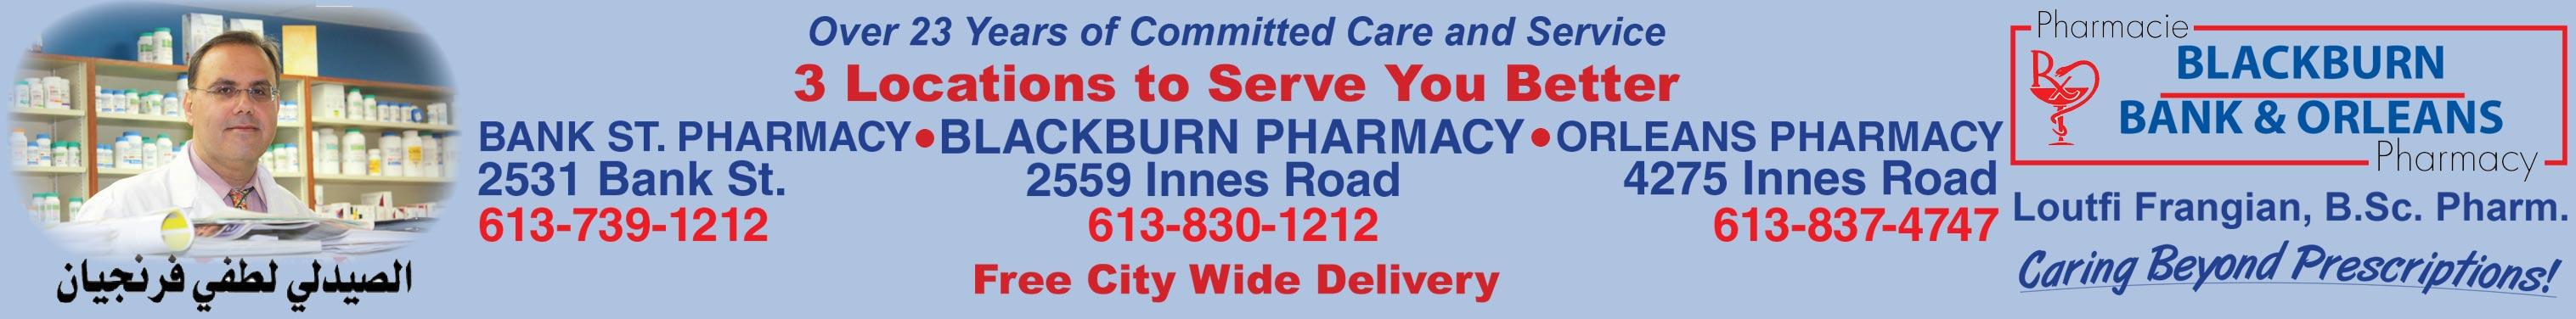 Lou Frangian - Pharmacies